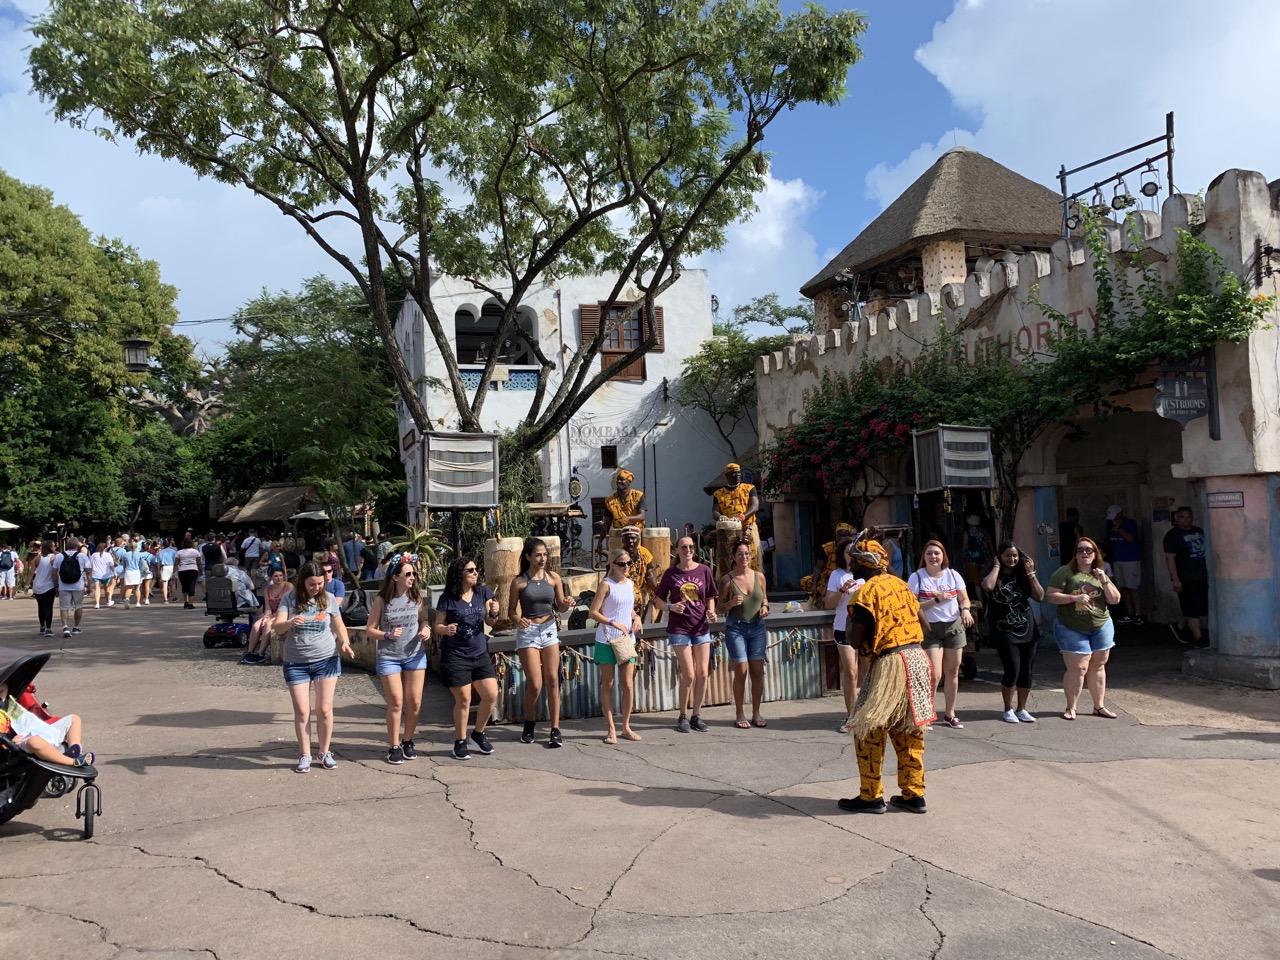 swge disney world trip report animal kingdom 01.jpeg